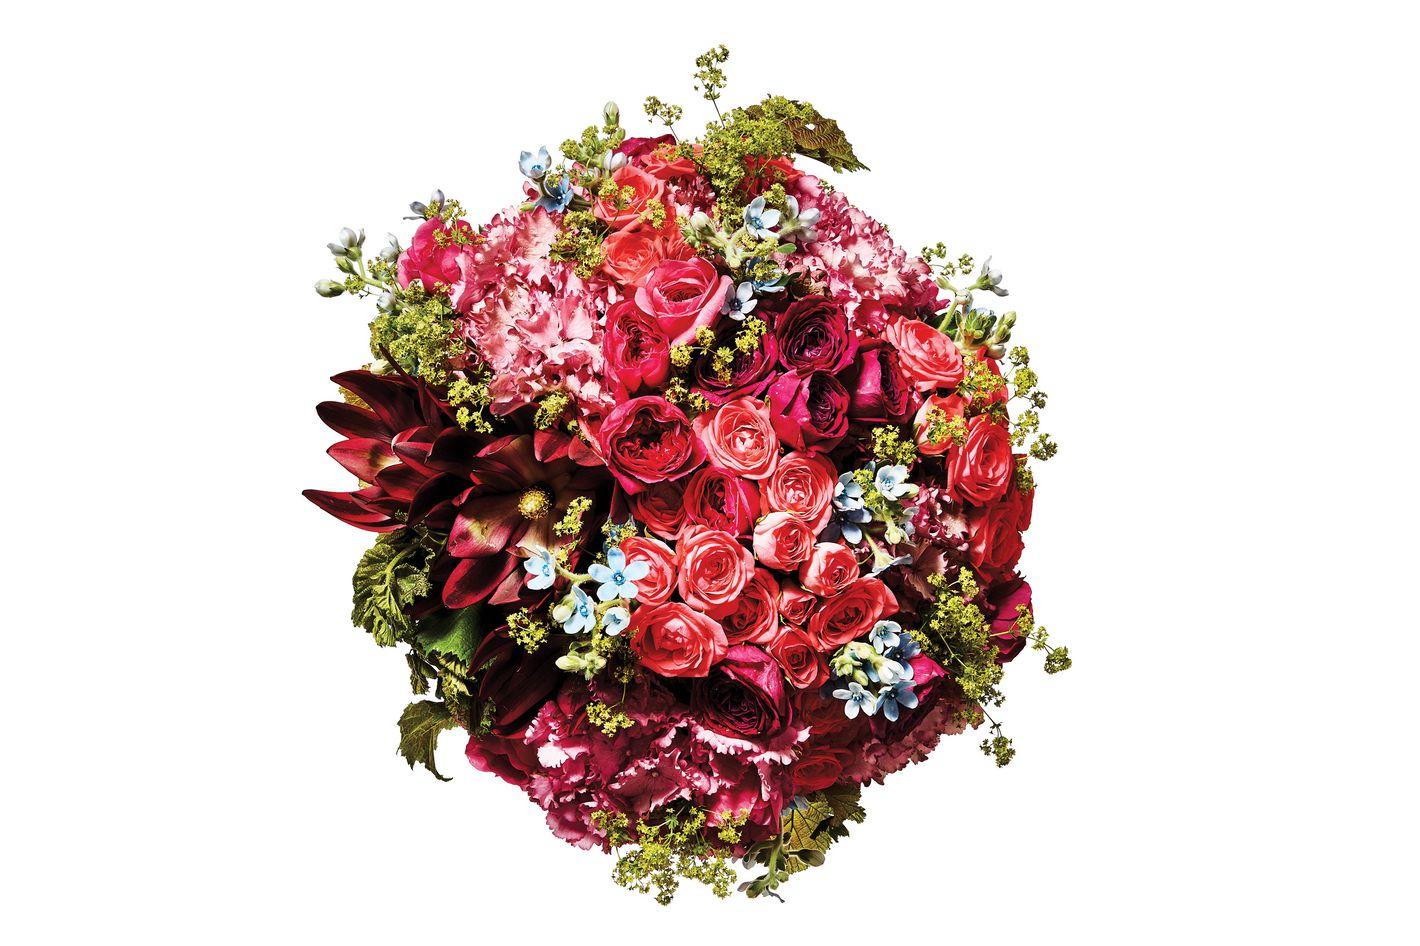 Dutch hydrangea, garden spray rose, garden rose, protea, tweedia, and lady's mantle